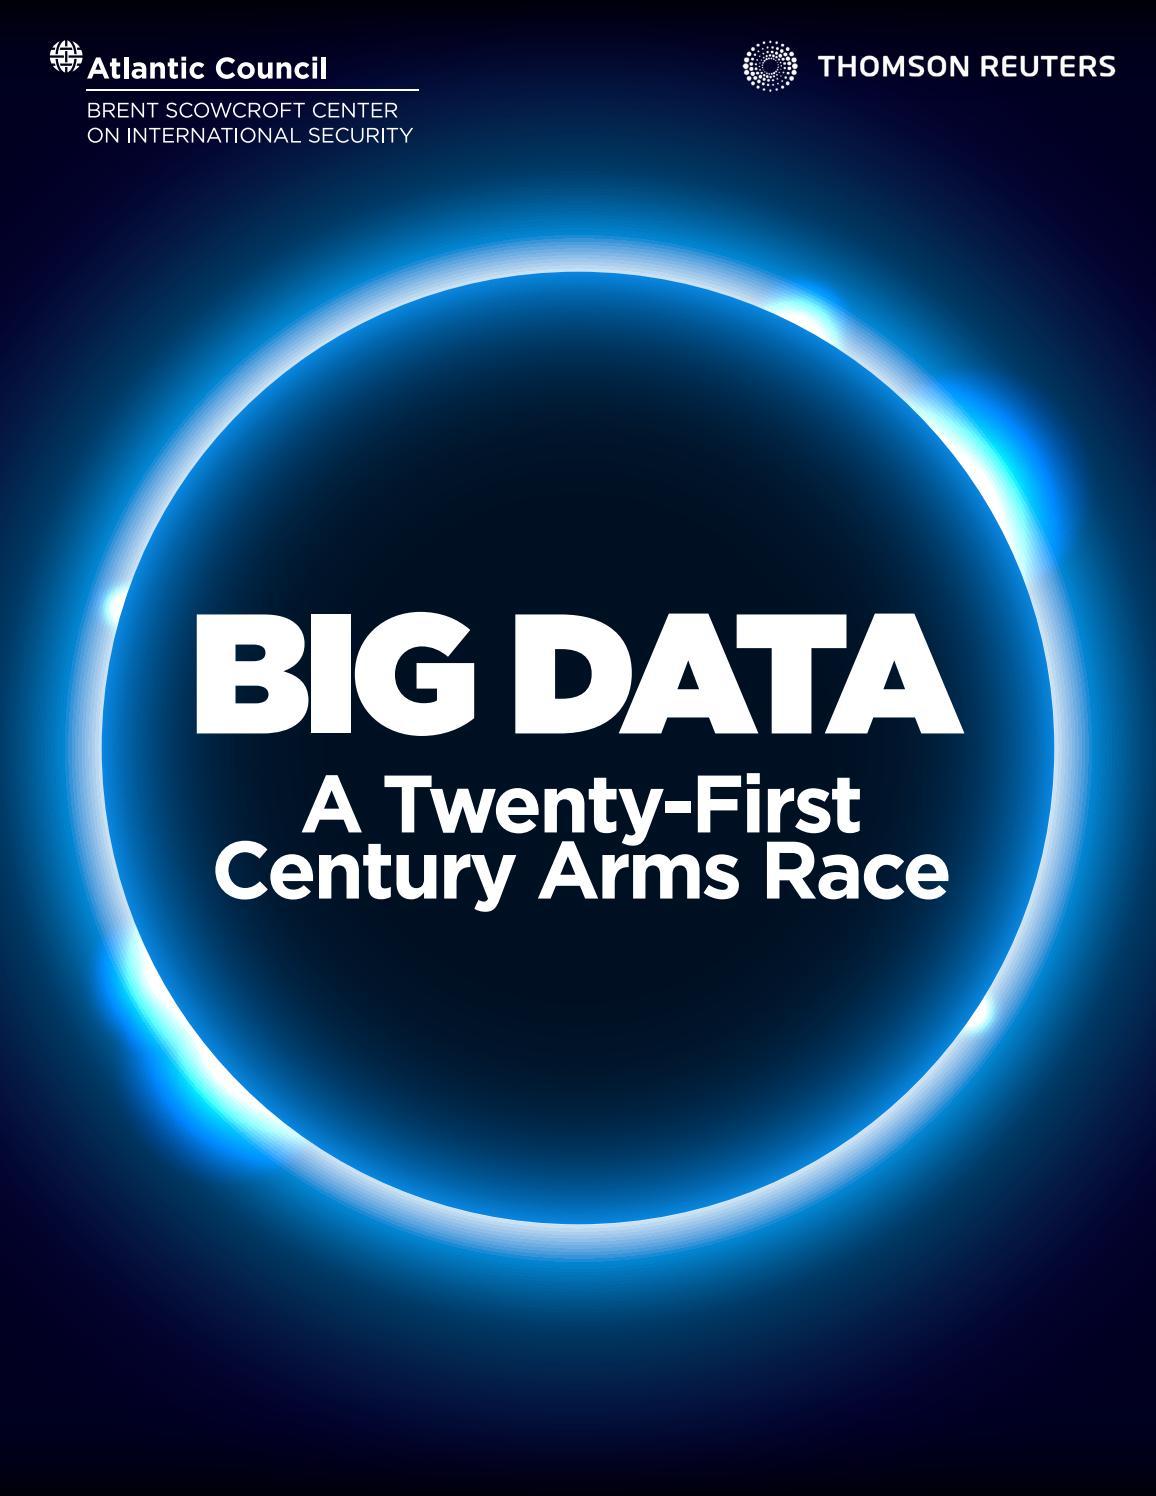 Big Data: A Twenty-First Century Arms Race by Atlantic